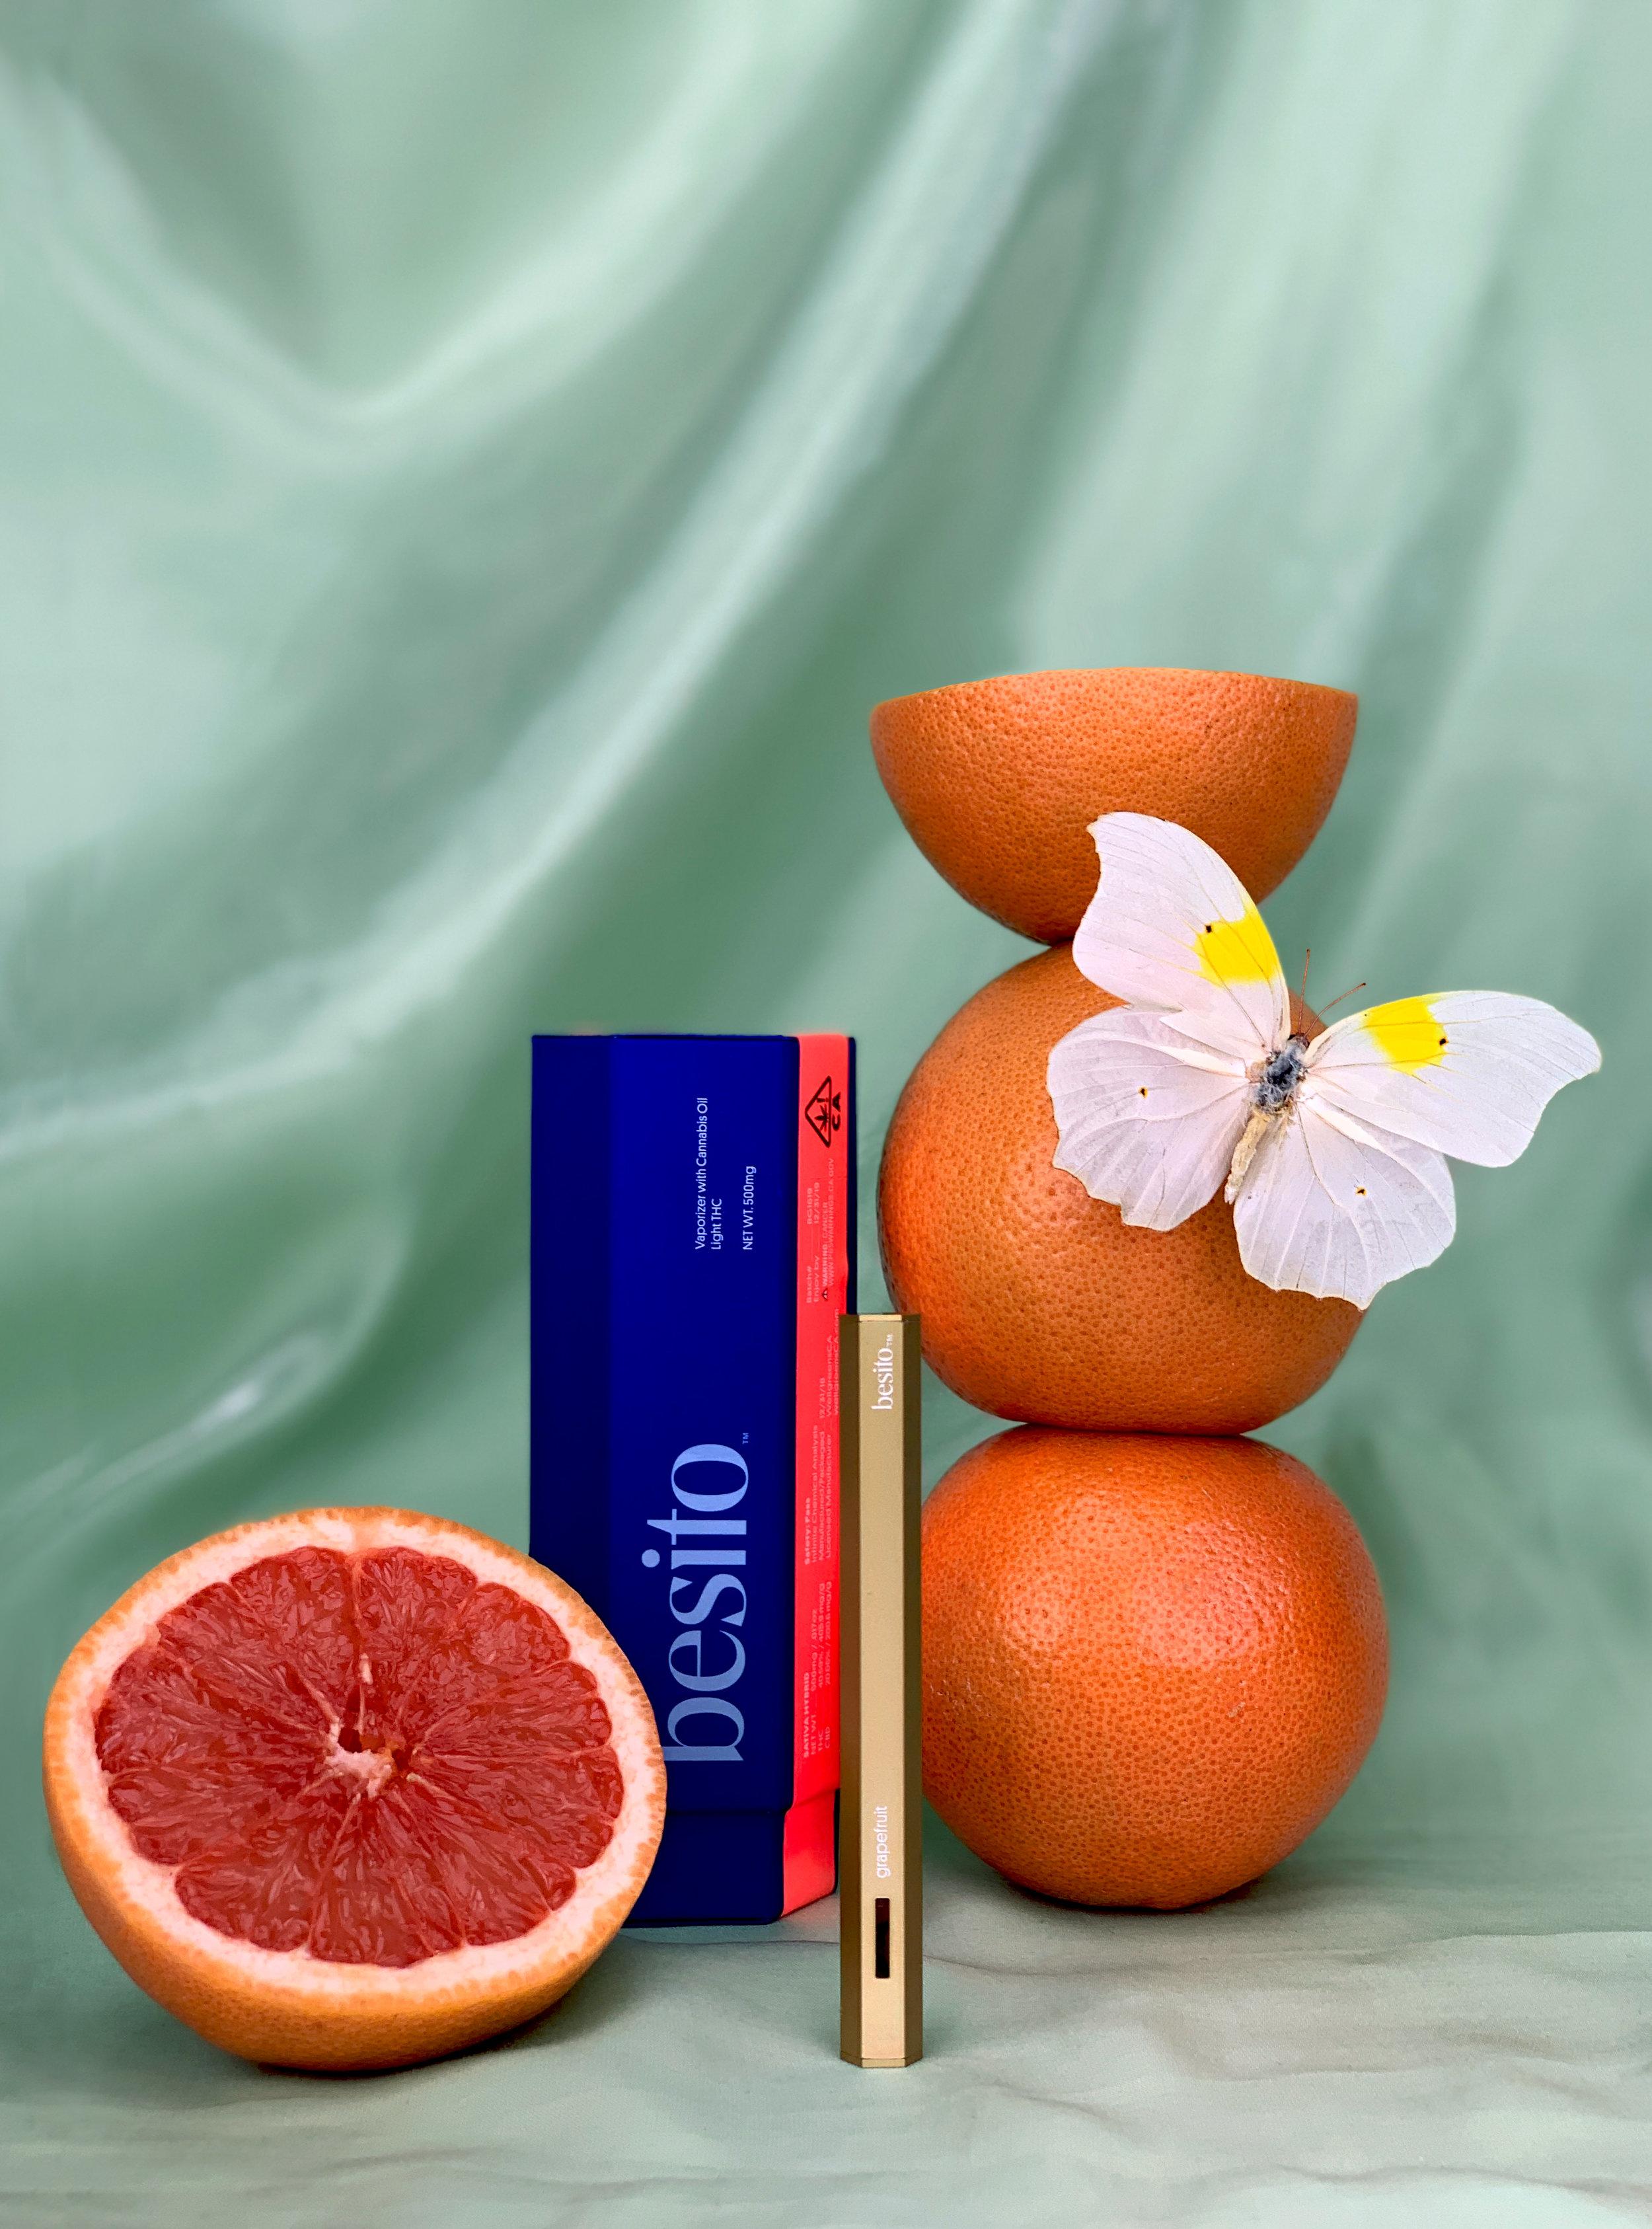 Besito's hexagonal vape pen comes in three, sativa-heavy flavors: grapefruit, mint, and blackberry.